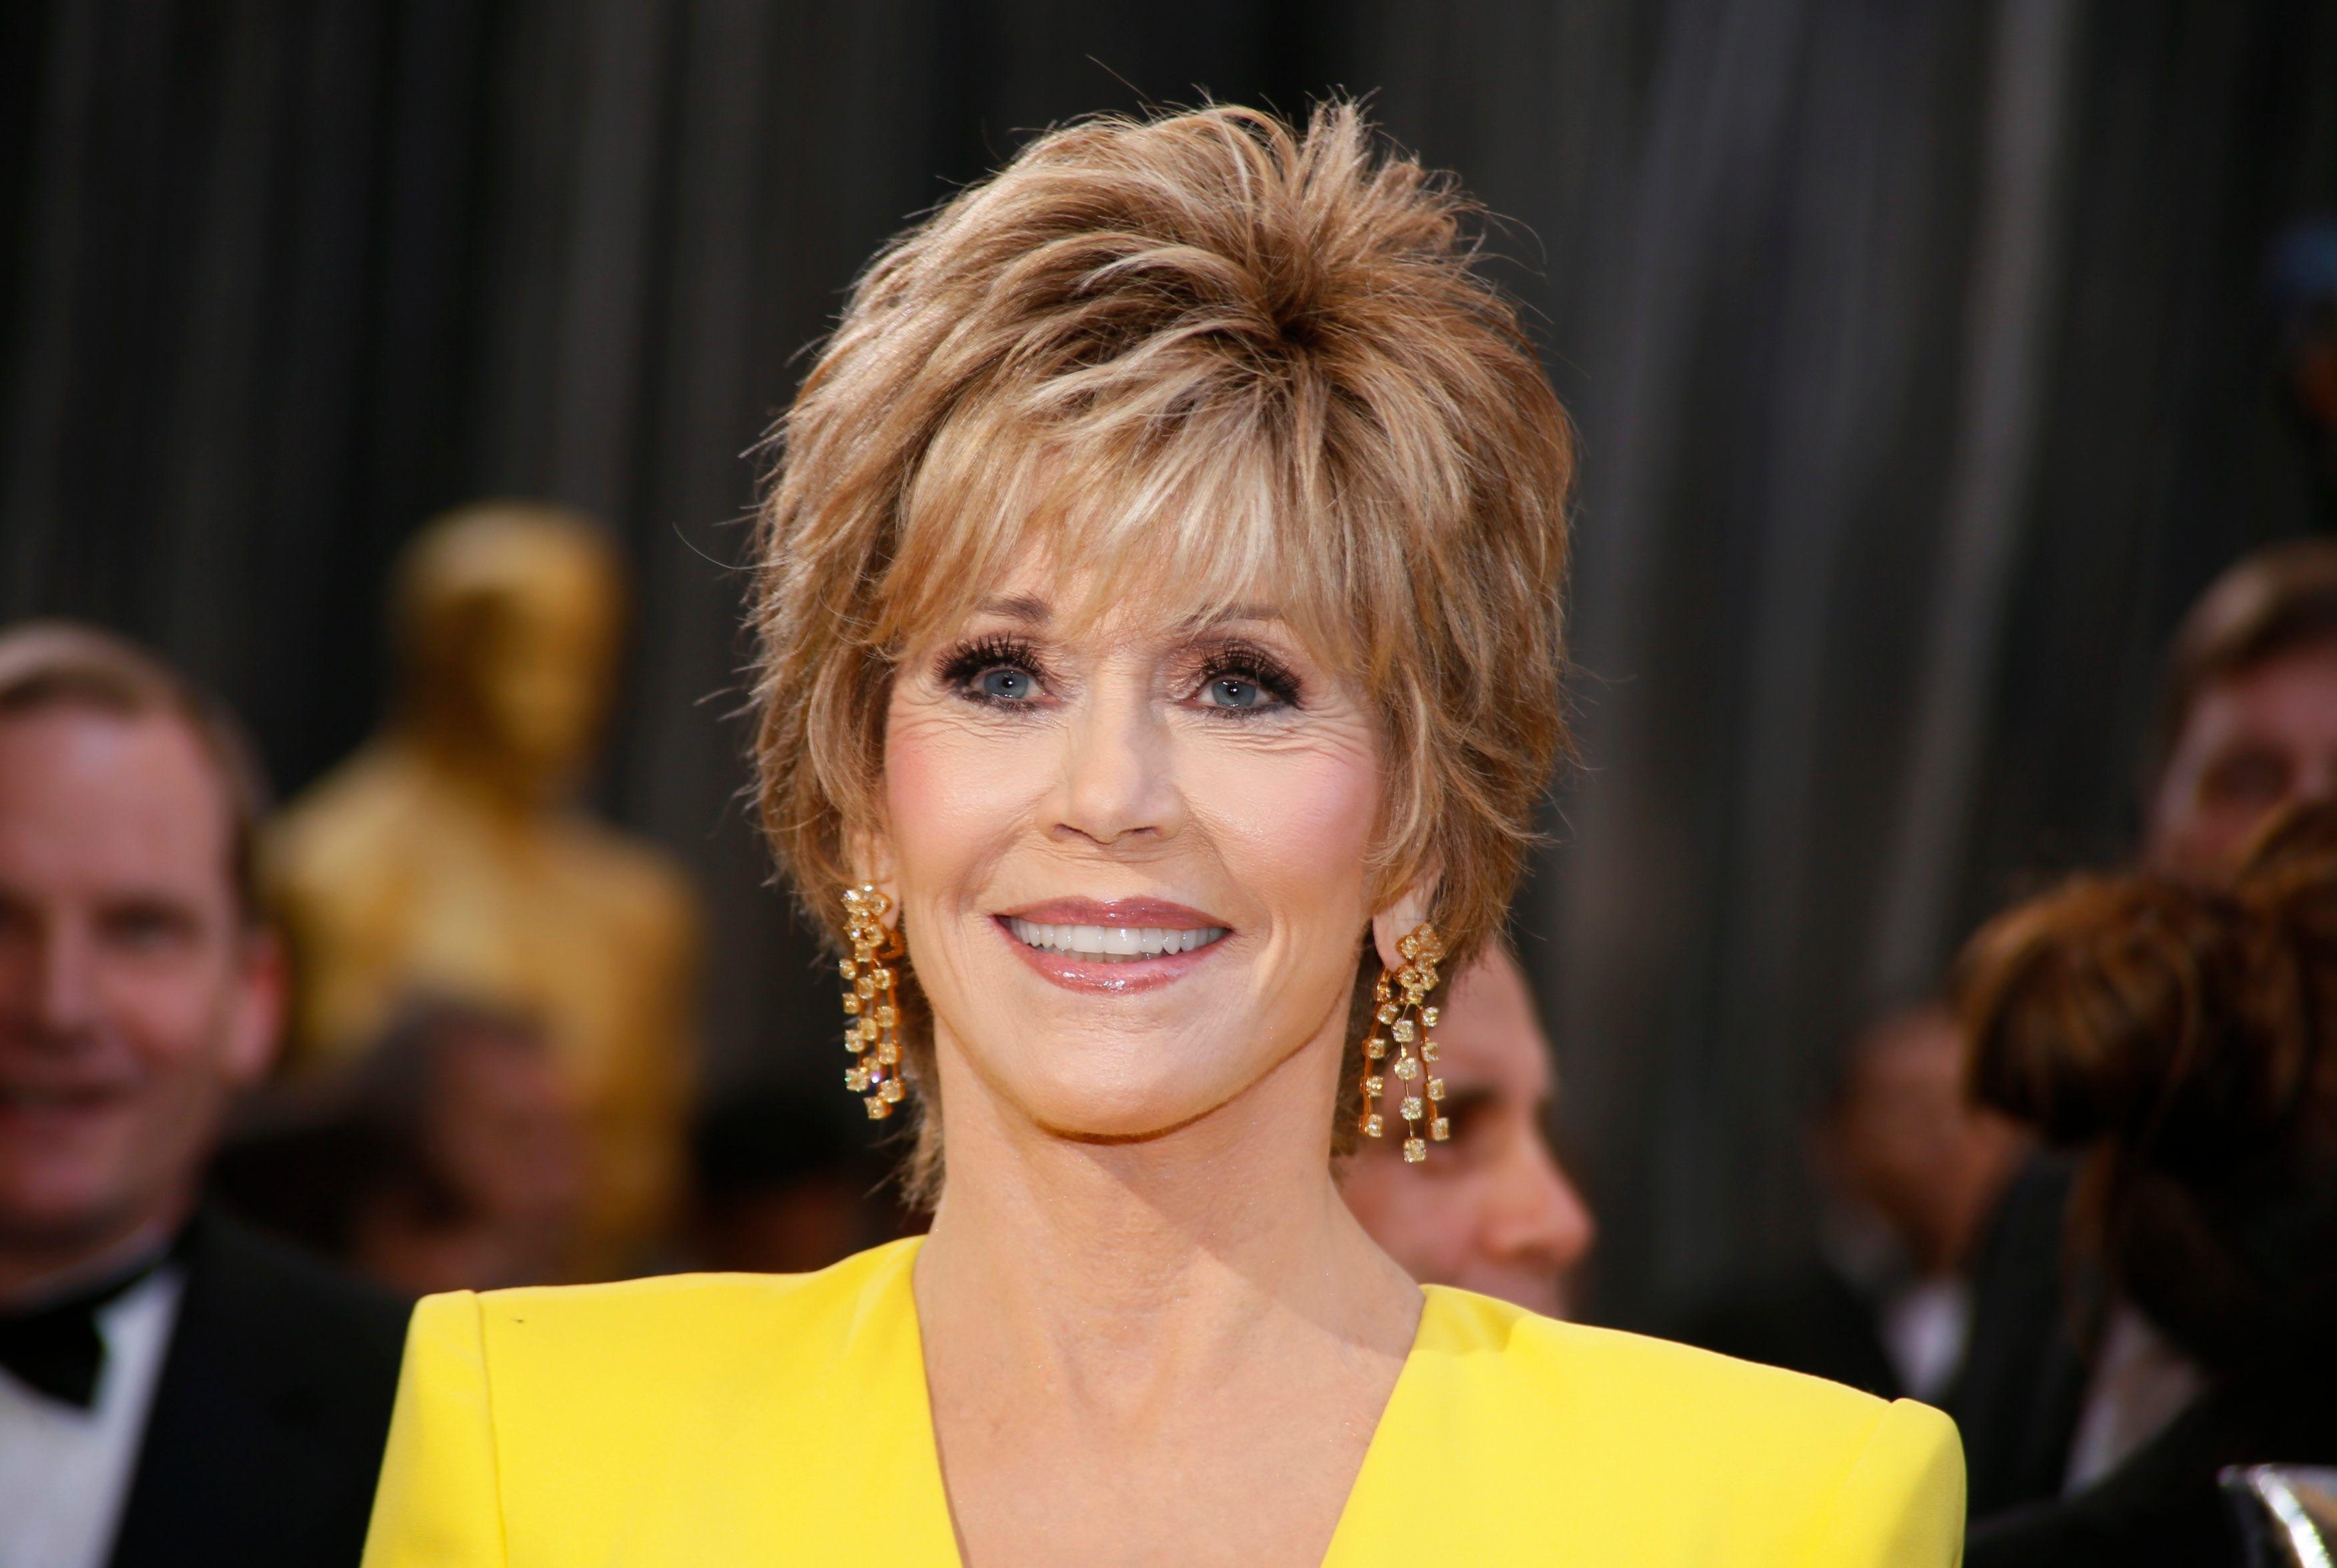 Jane Fonda I knew about Harvey Weinstein and kept quiet